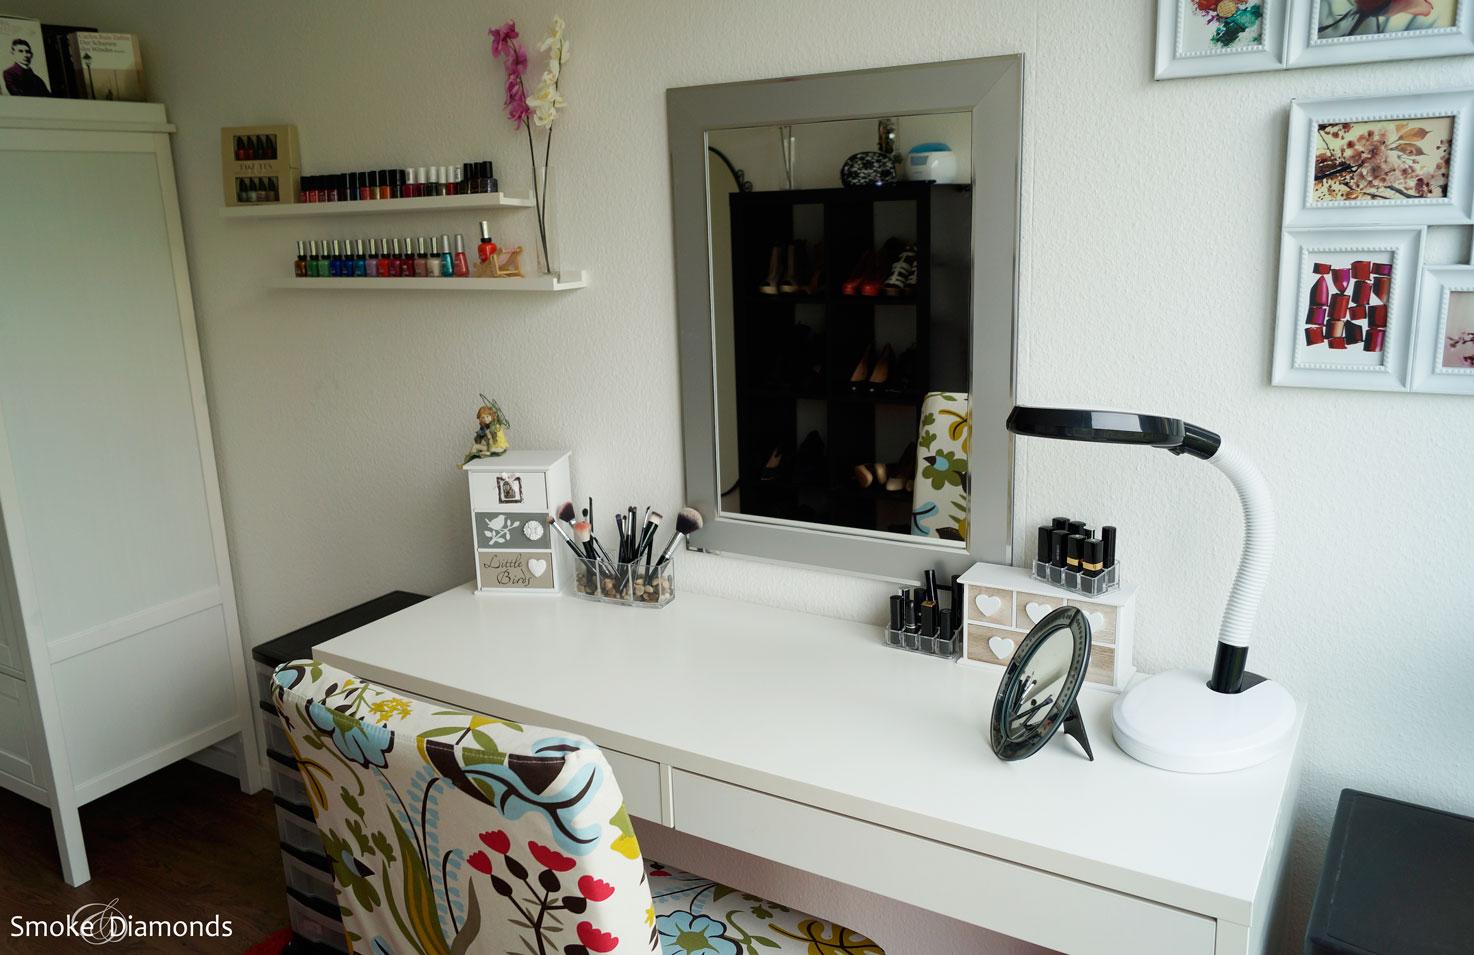 Ikea micke schreibtisch als schminktisch  Smoke and Diamonds - Mein Schminkzimmer: Möbel... - Smoke and Diamonds